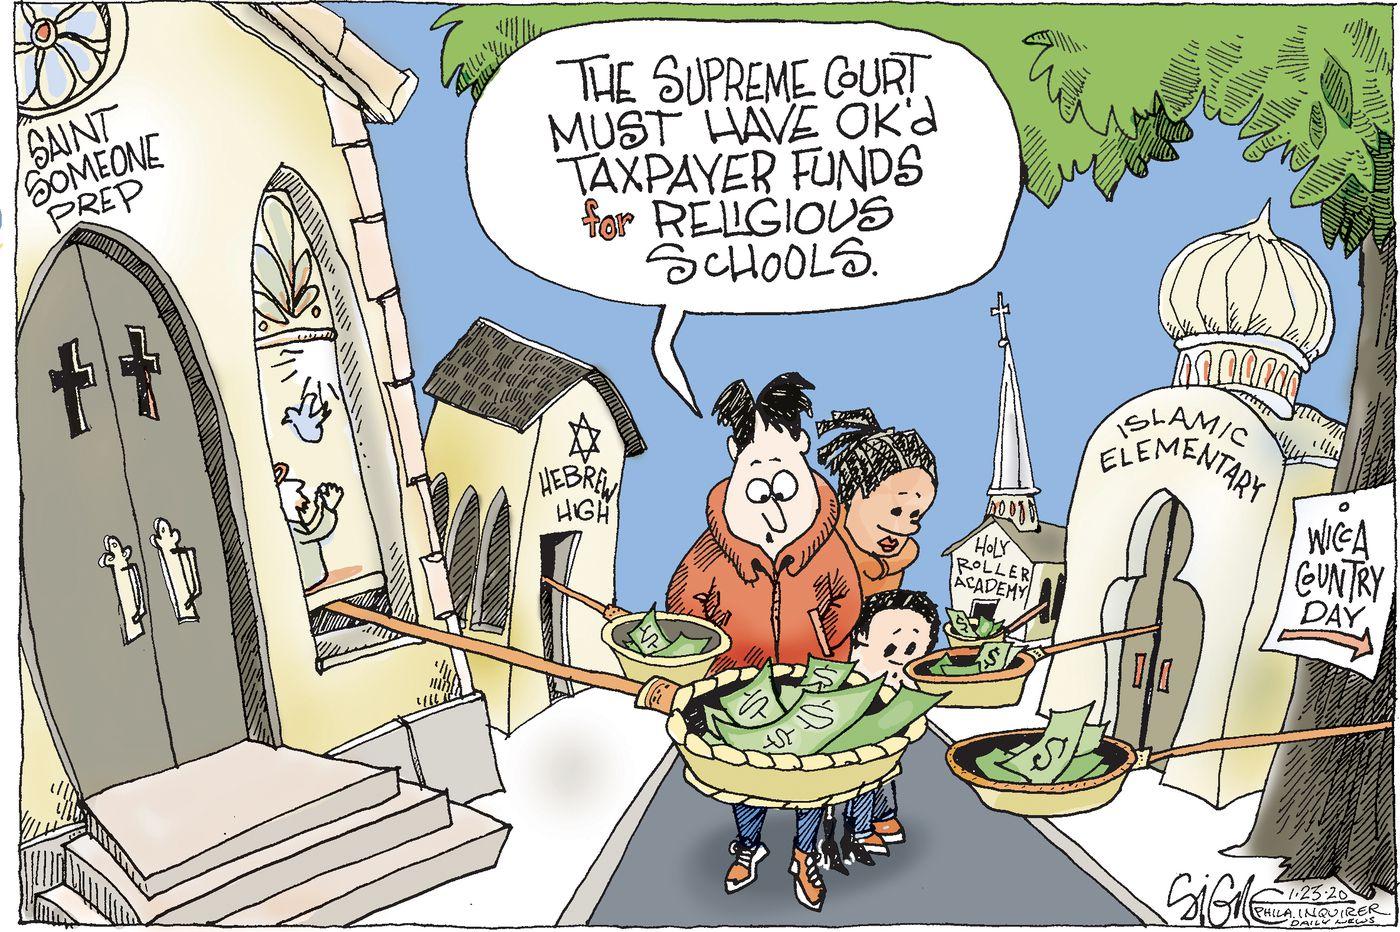 Political Cartoon: Taxpayer money for religious schools